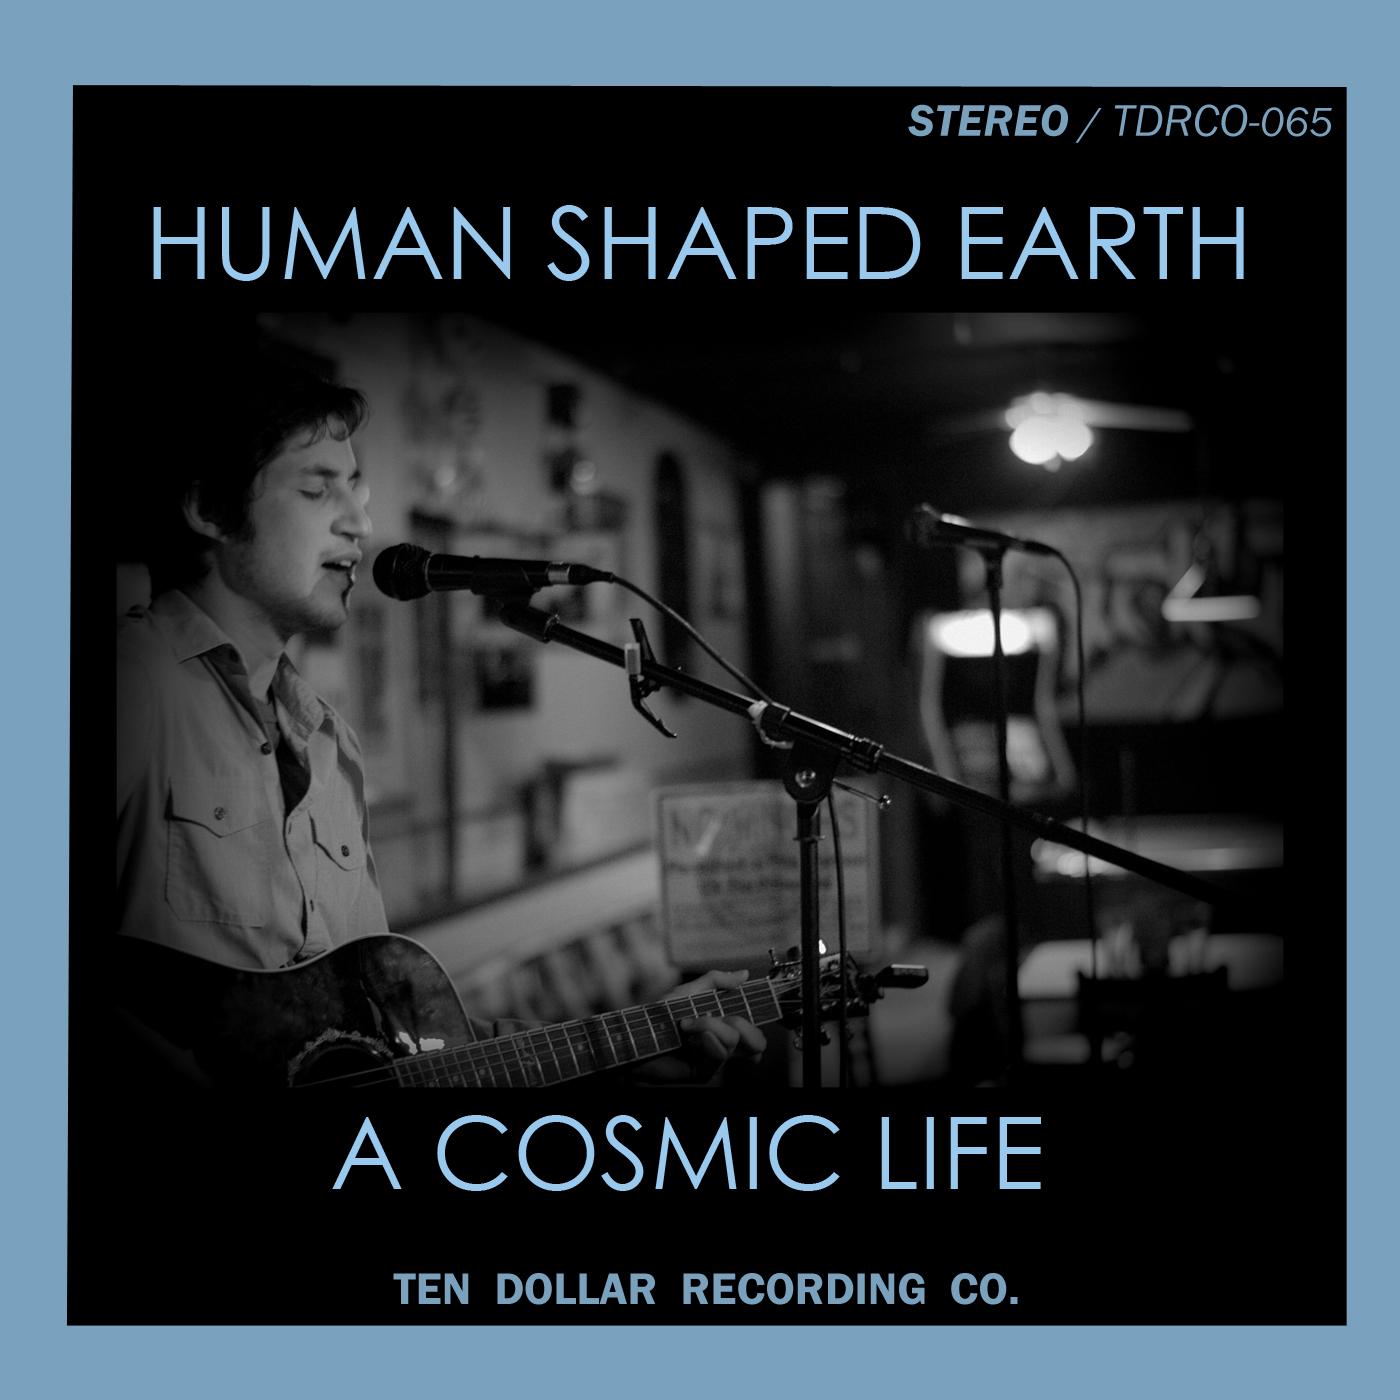 Human Shaped Earth - A Cosmic Life (Single)